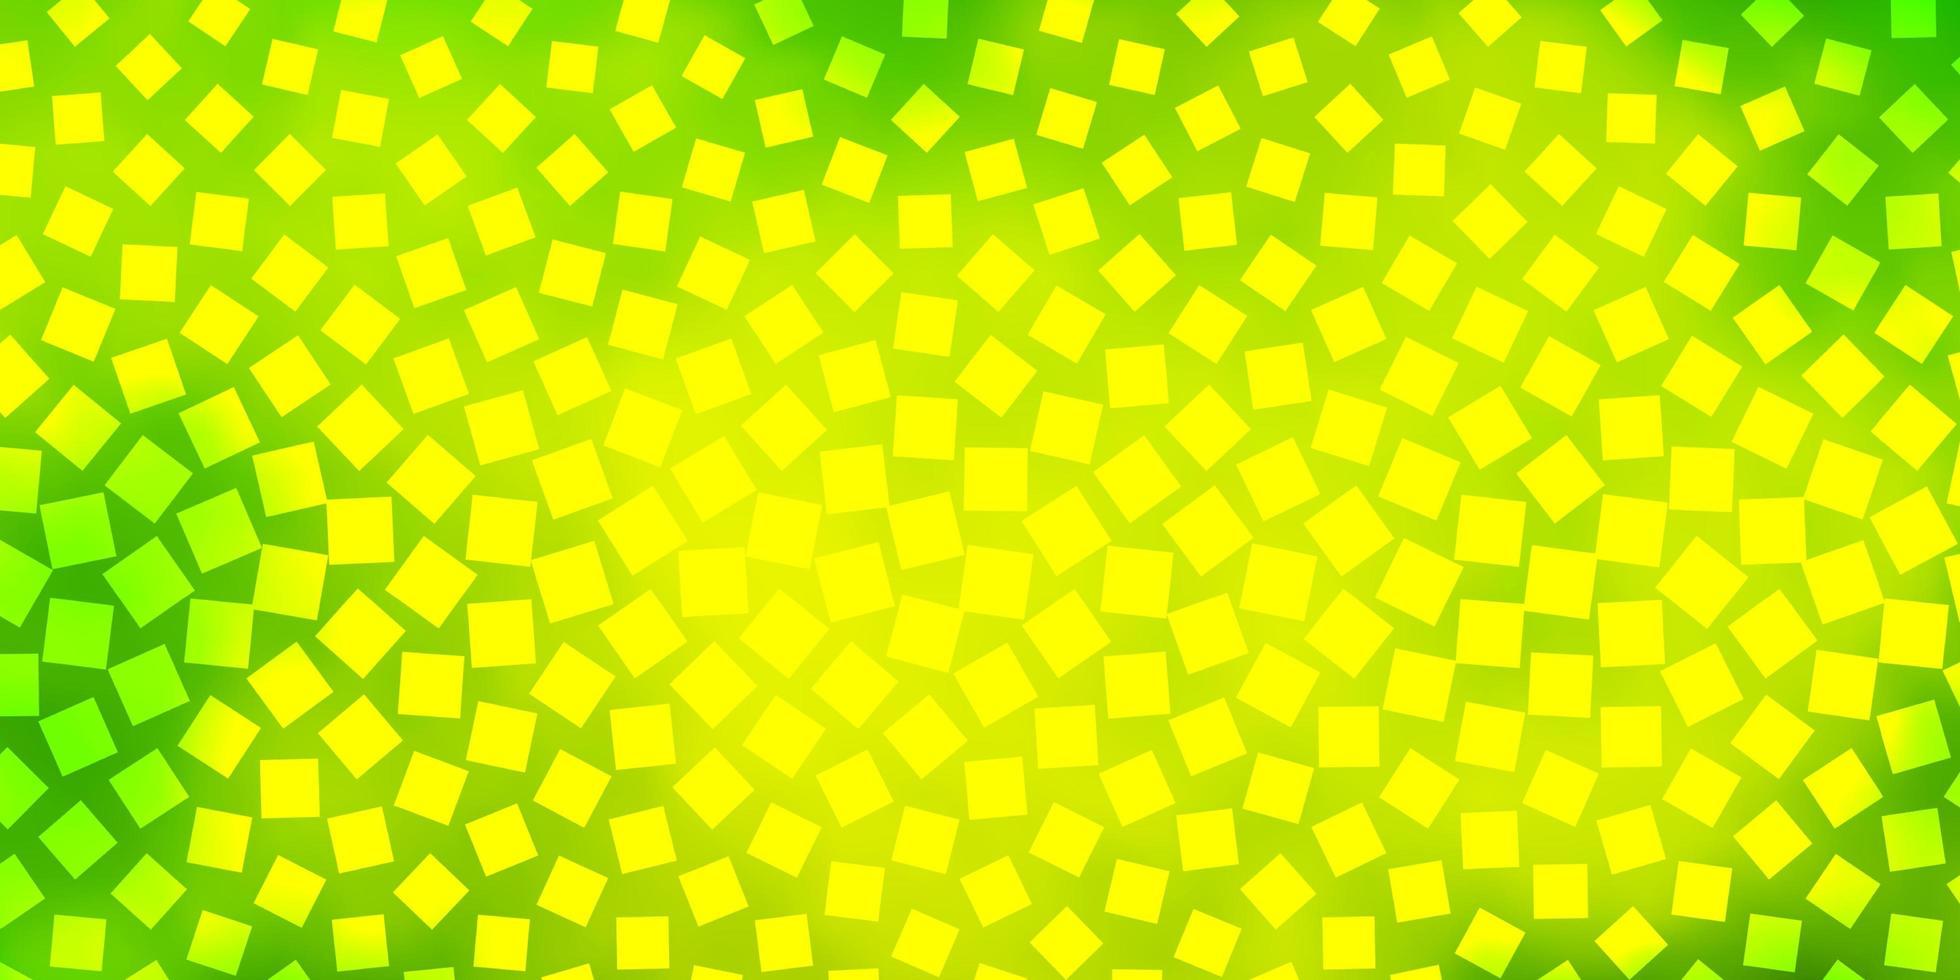 ljusgrön, gul vektorbakgrund i polygonal stil. vektor